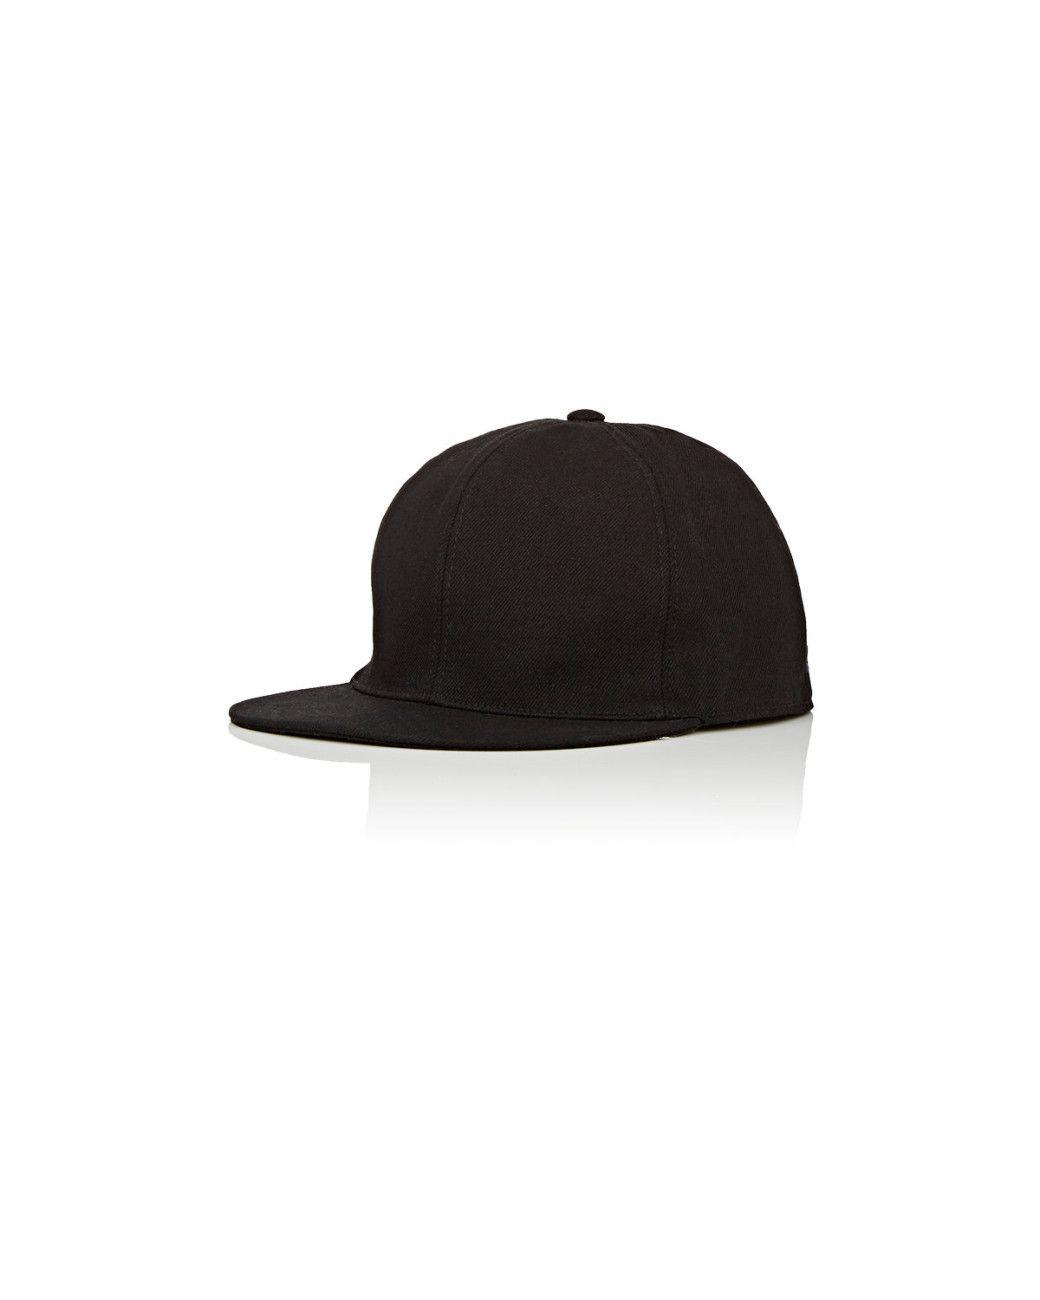 8f2987855 Men's Black Star | Cloth | Embroidered baseball caps, Givenchy, Black